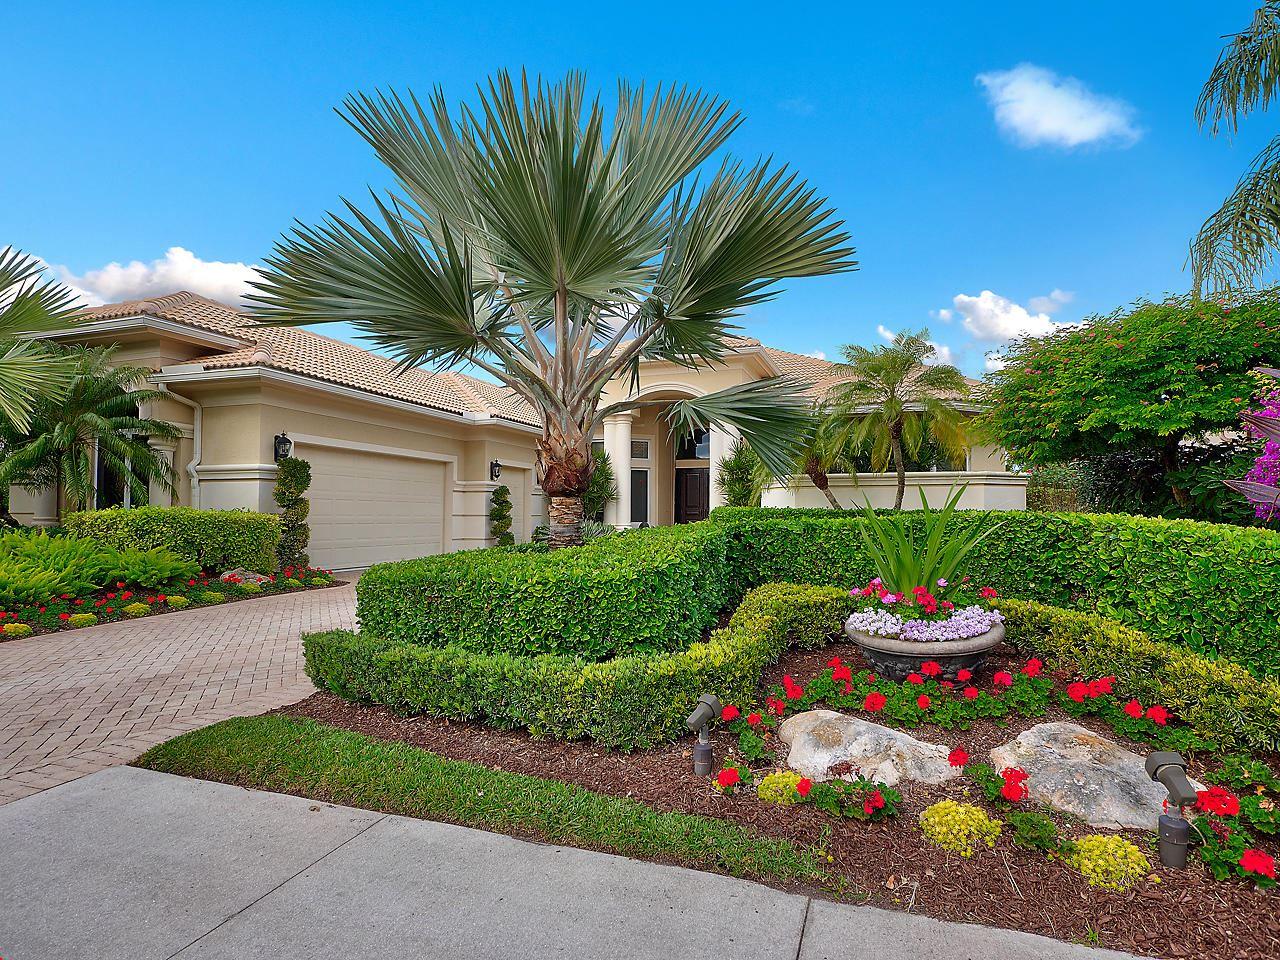 Photo of 118 Windsor Pointe Drive, Palm Beach Gardens, FL 33418 (MLS # RX-10686255)